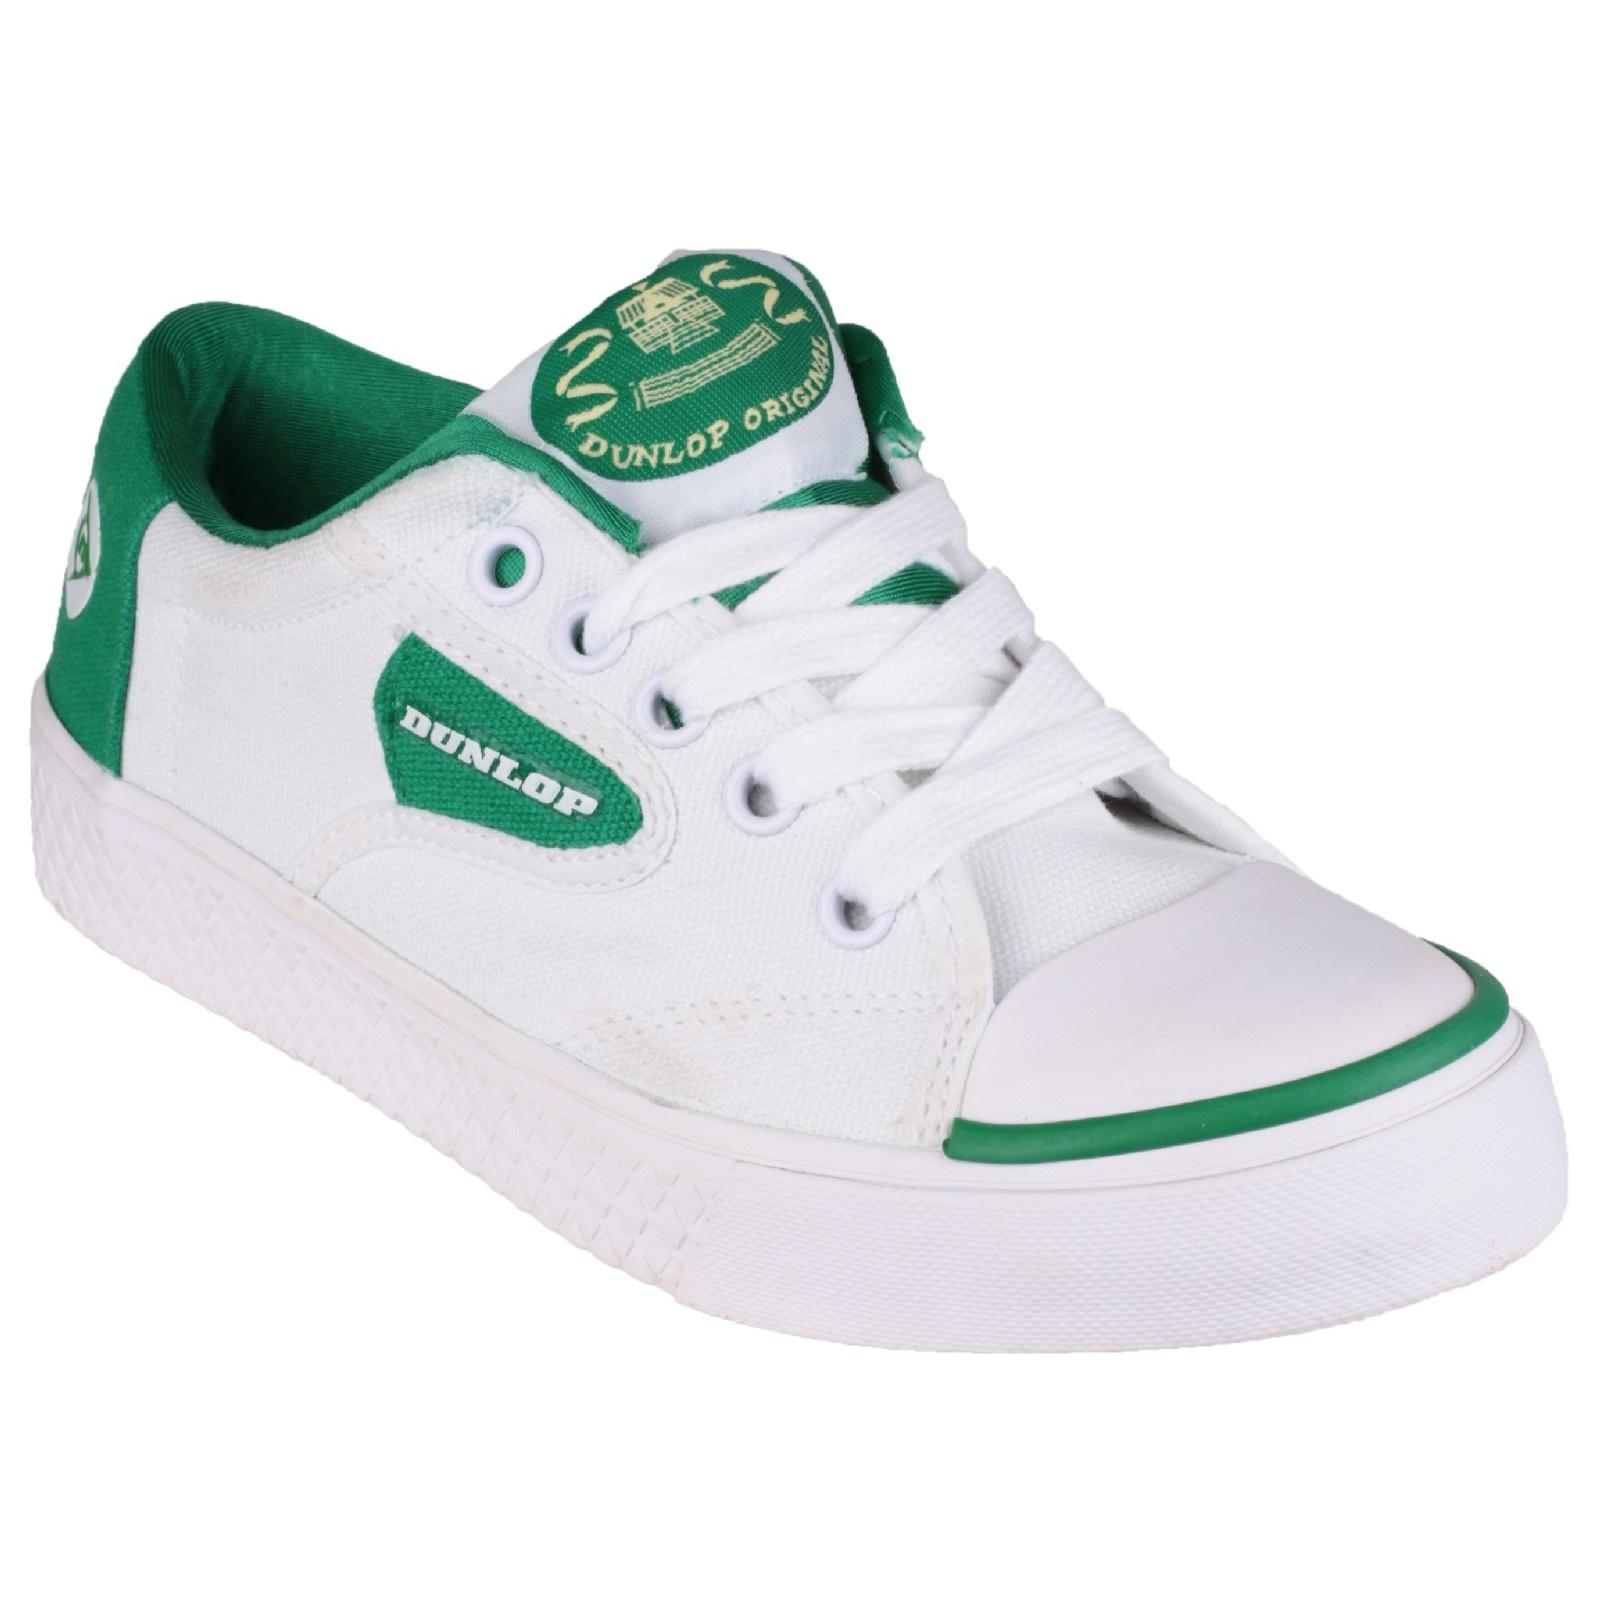 Dunlop Green Flash DU1555 Non-Marking Trainer / Boys Trainers / Unisex Sports (13 UK Junior) (White)